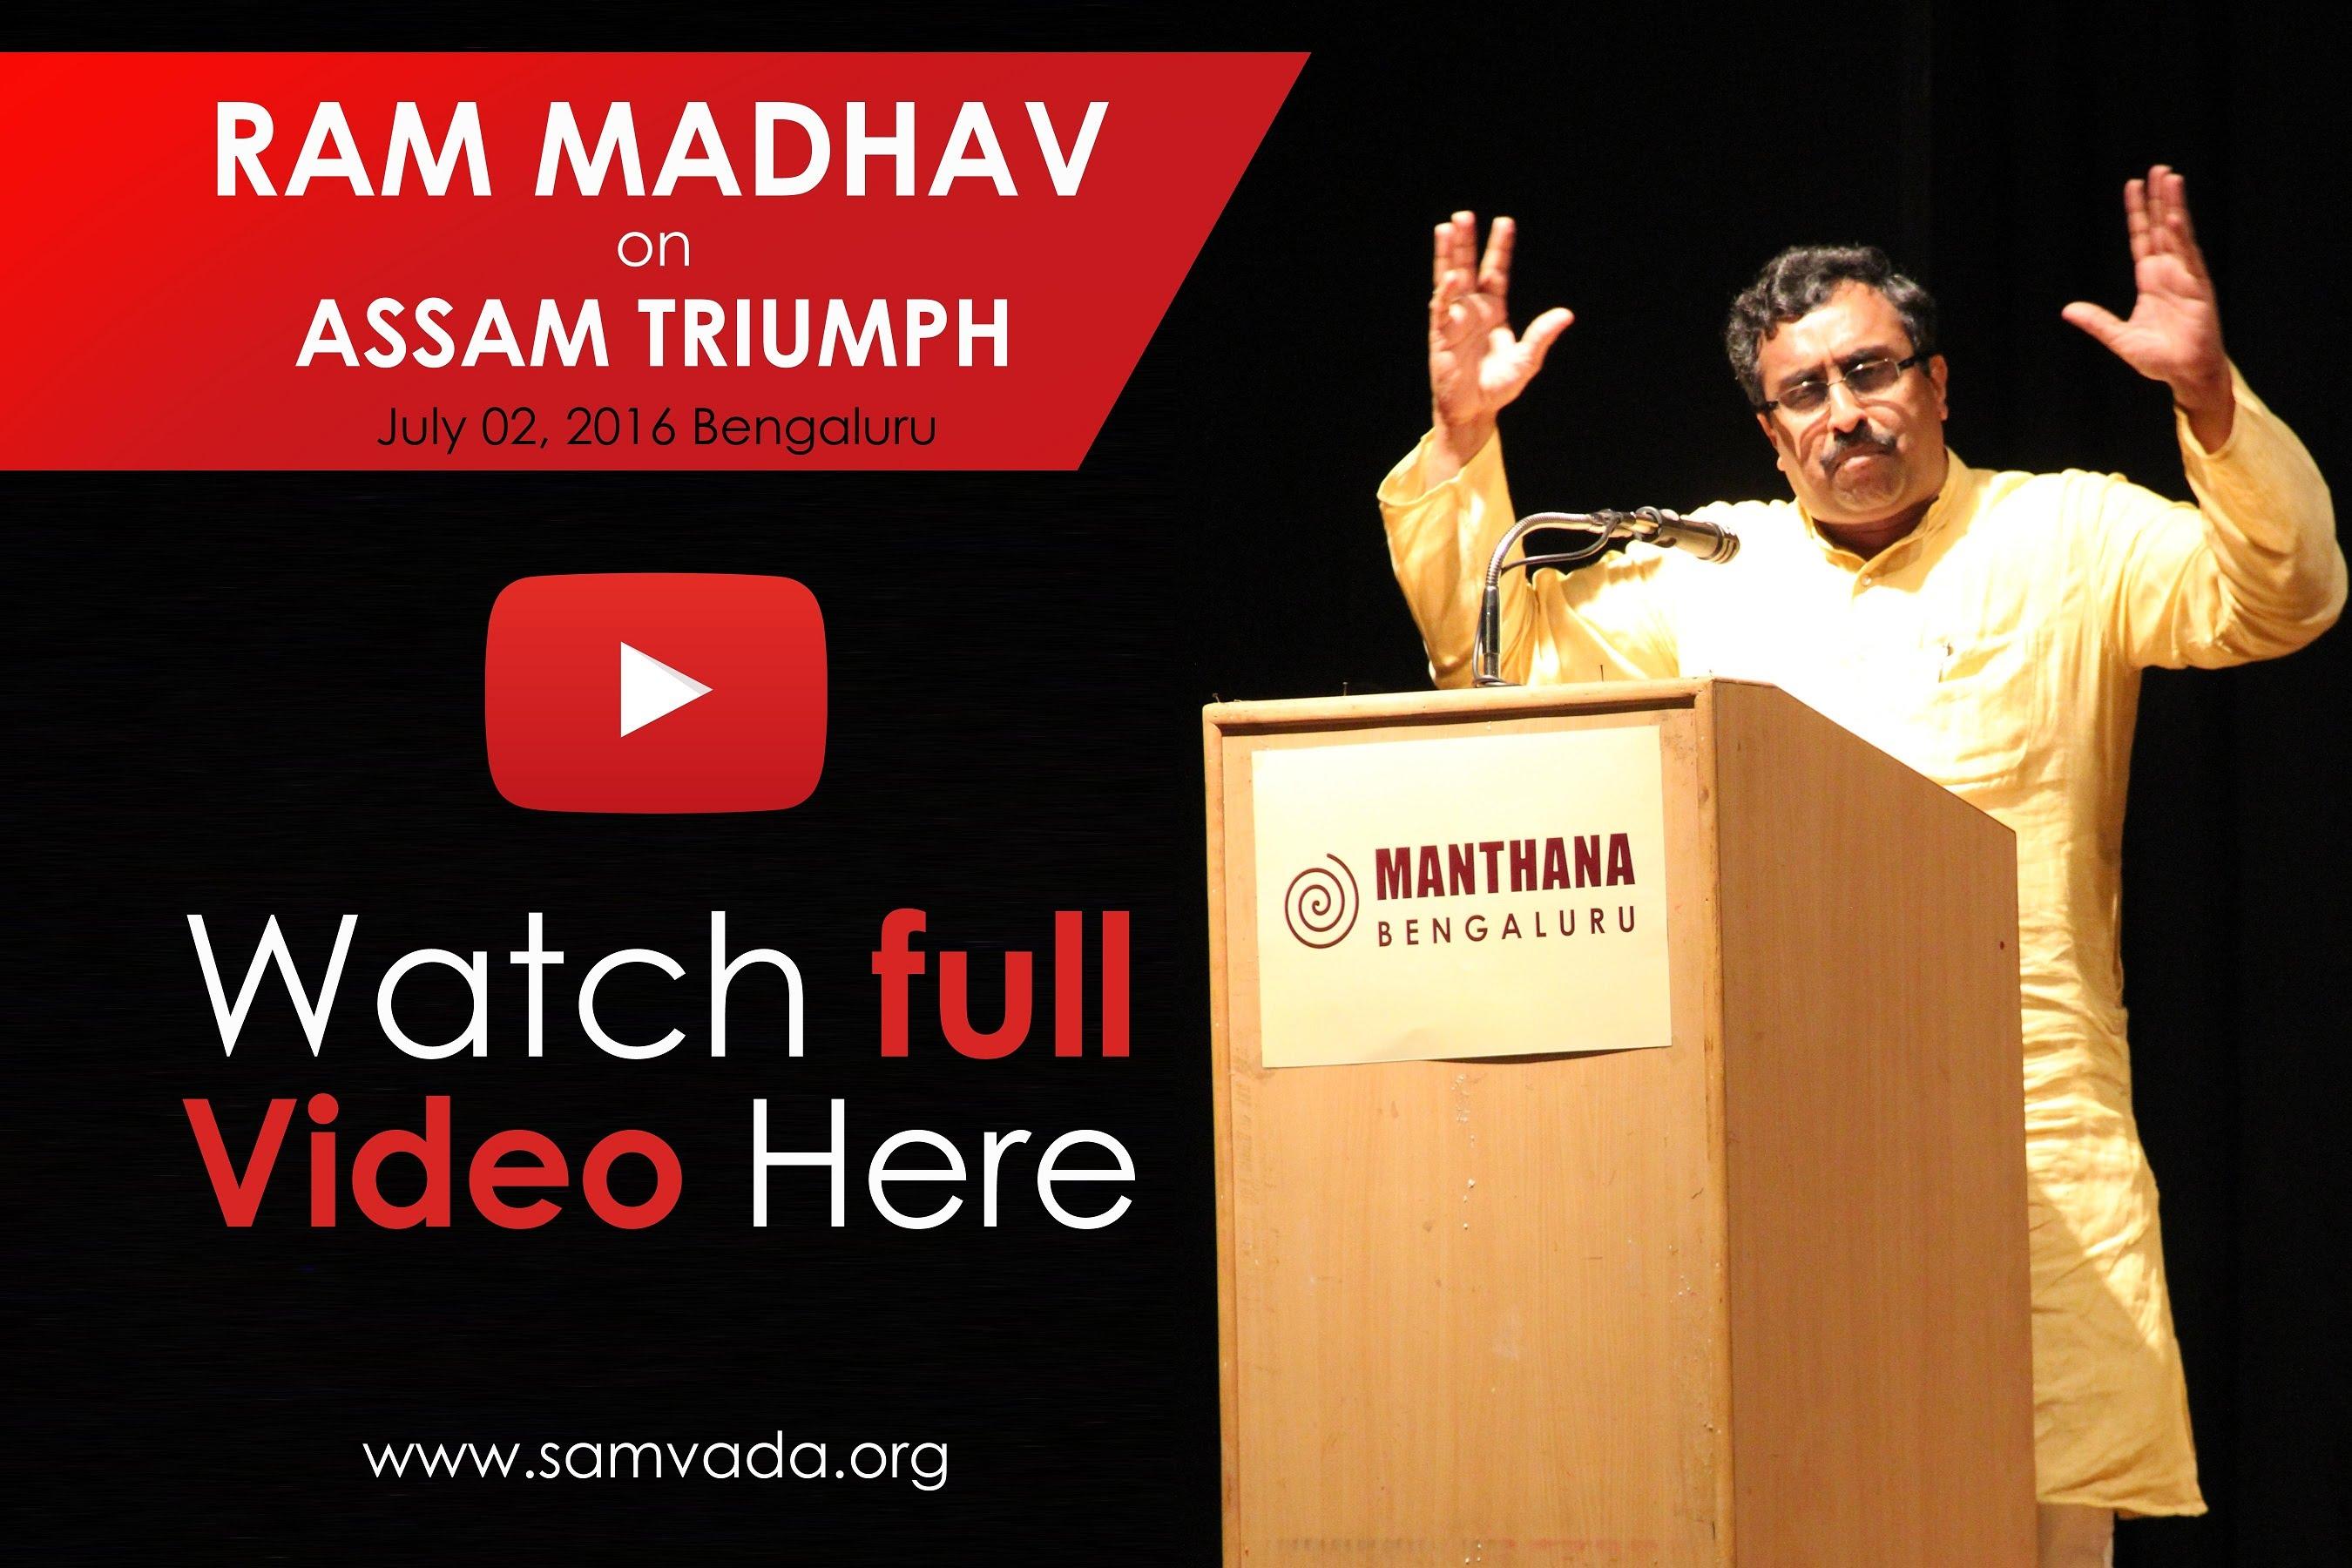 VIDEO: Ram Madhav talks on 'The Assam Triumph' in Manthana event Bengaluru